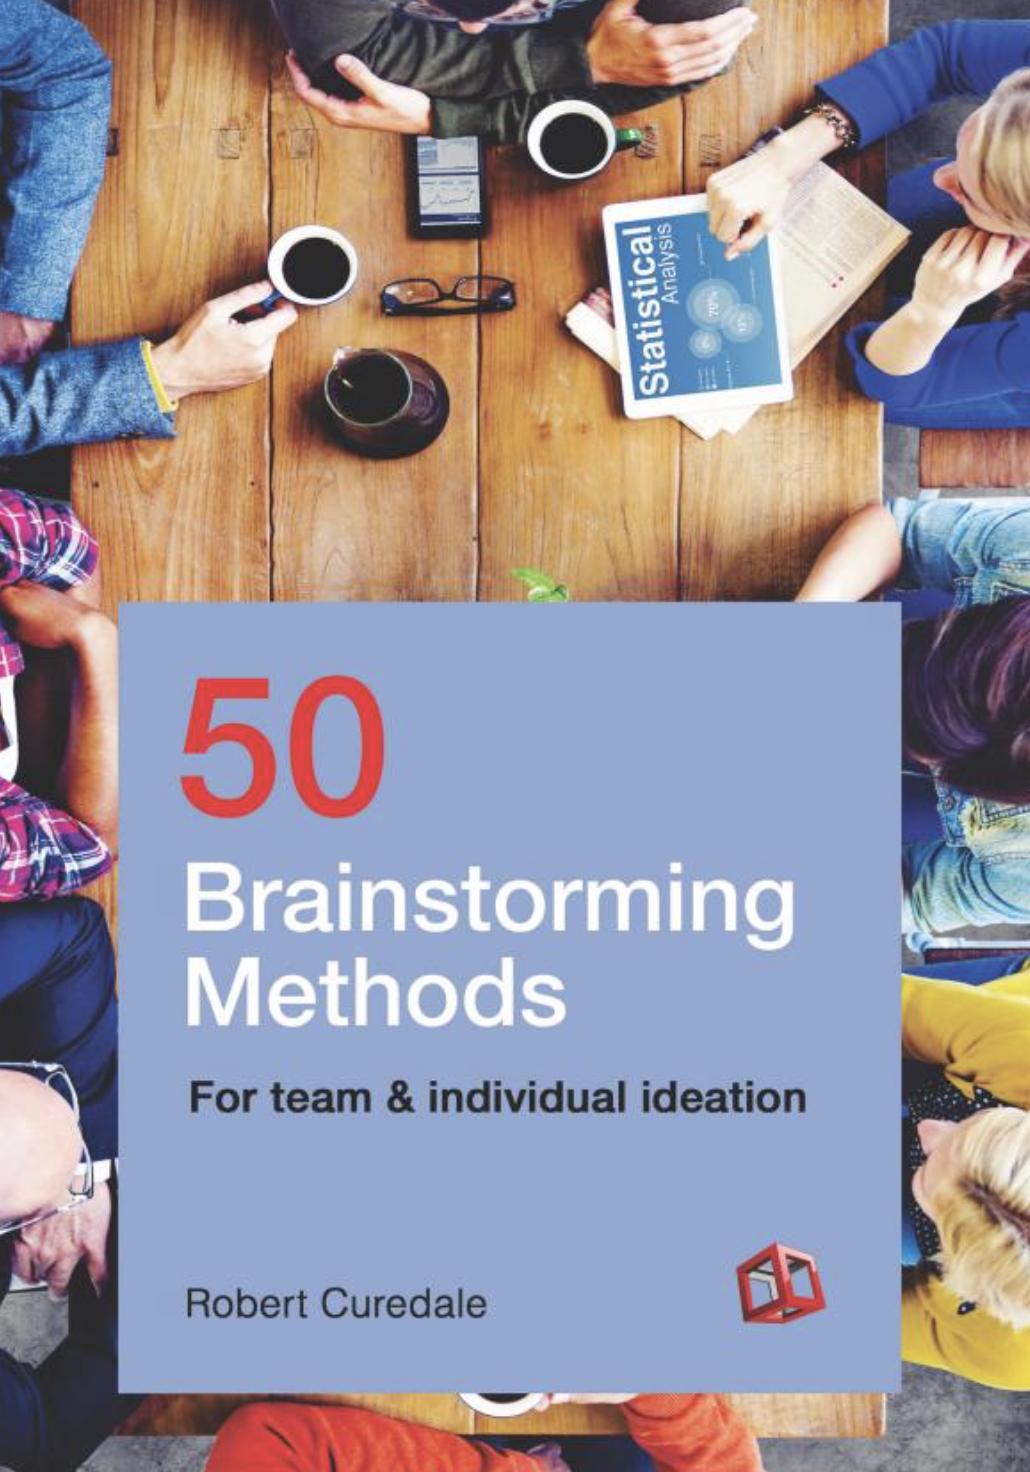 50 brainstorming methods book cover